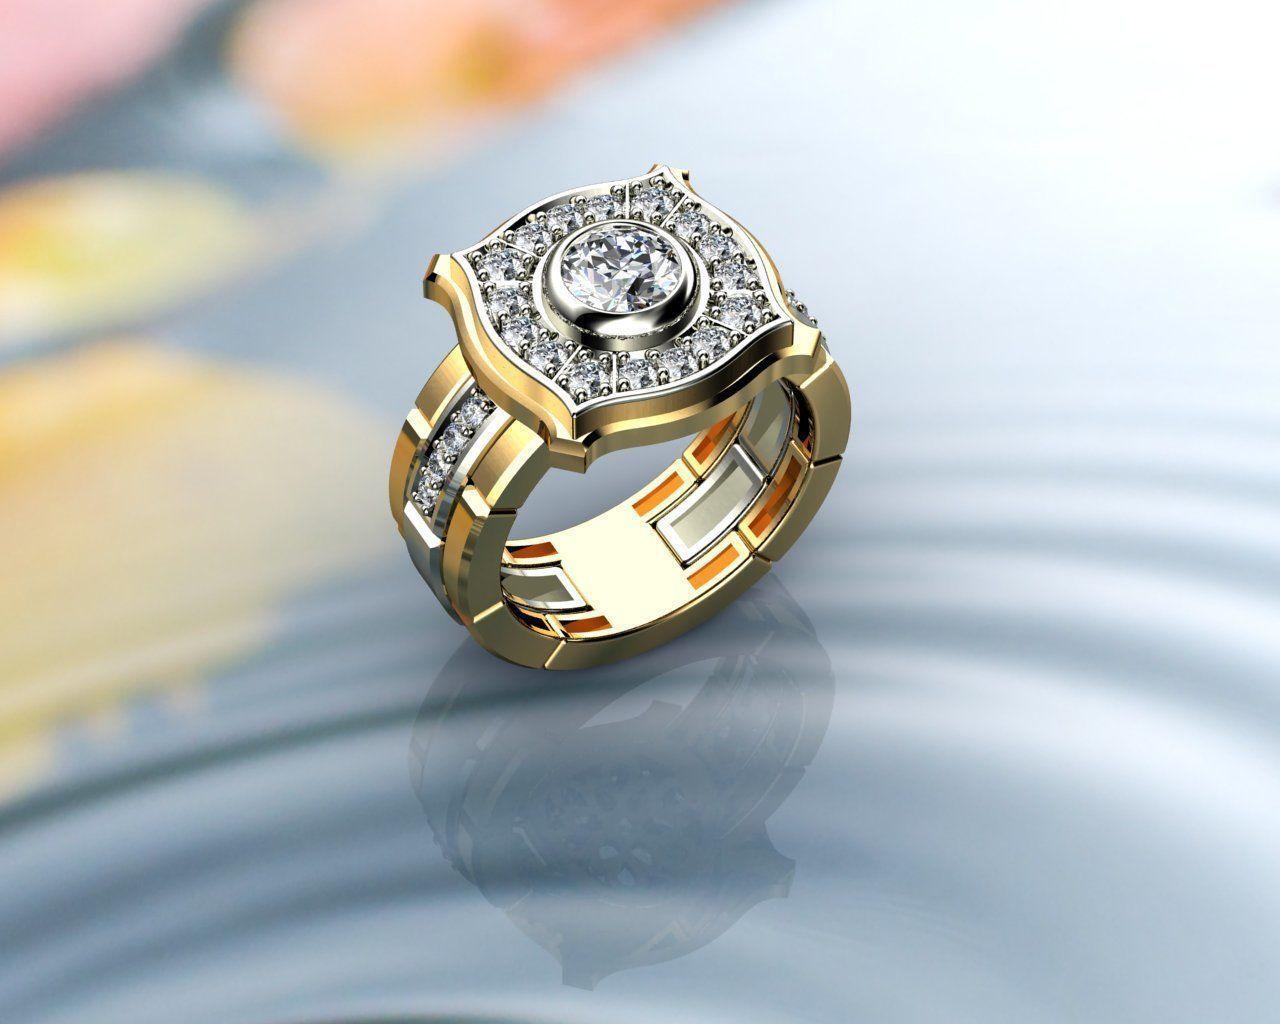 Rolex Style Men Ring